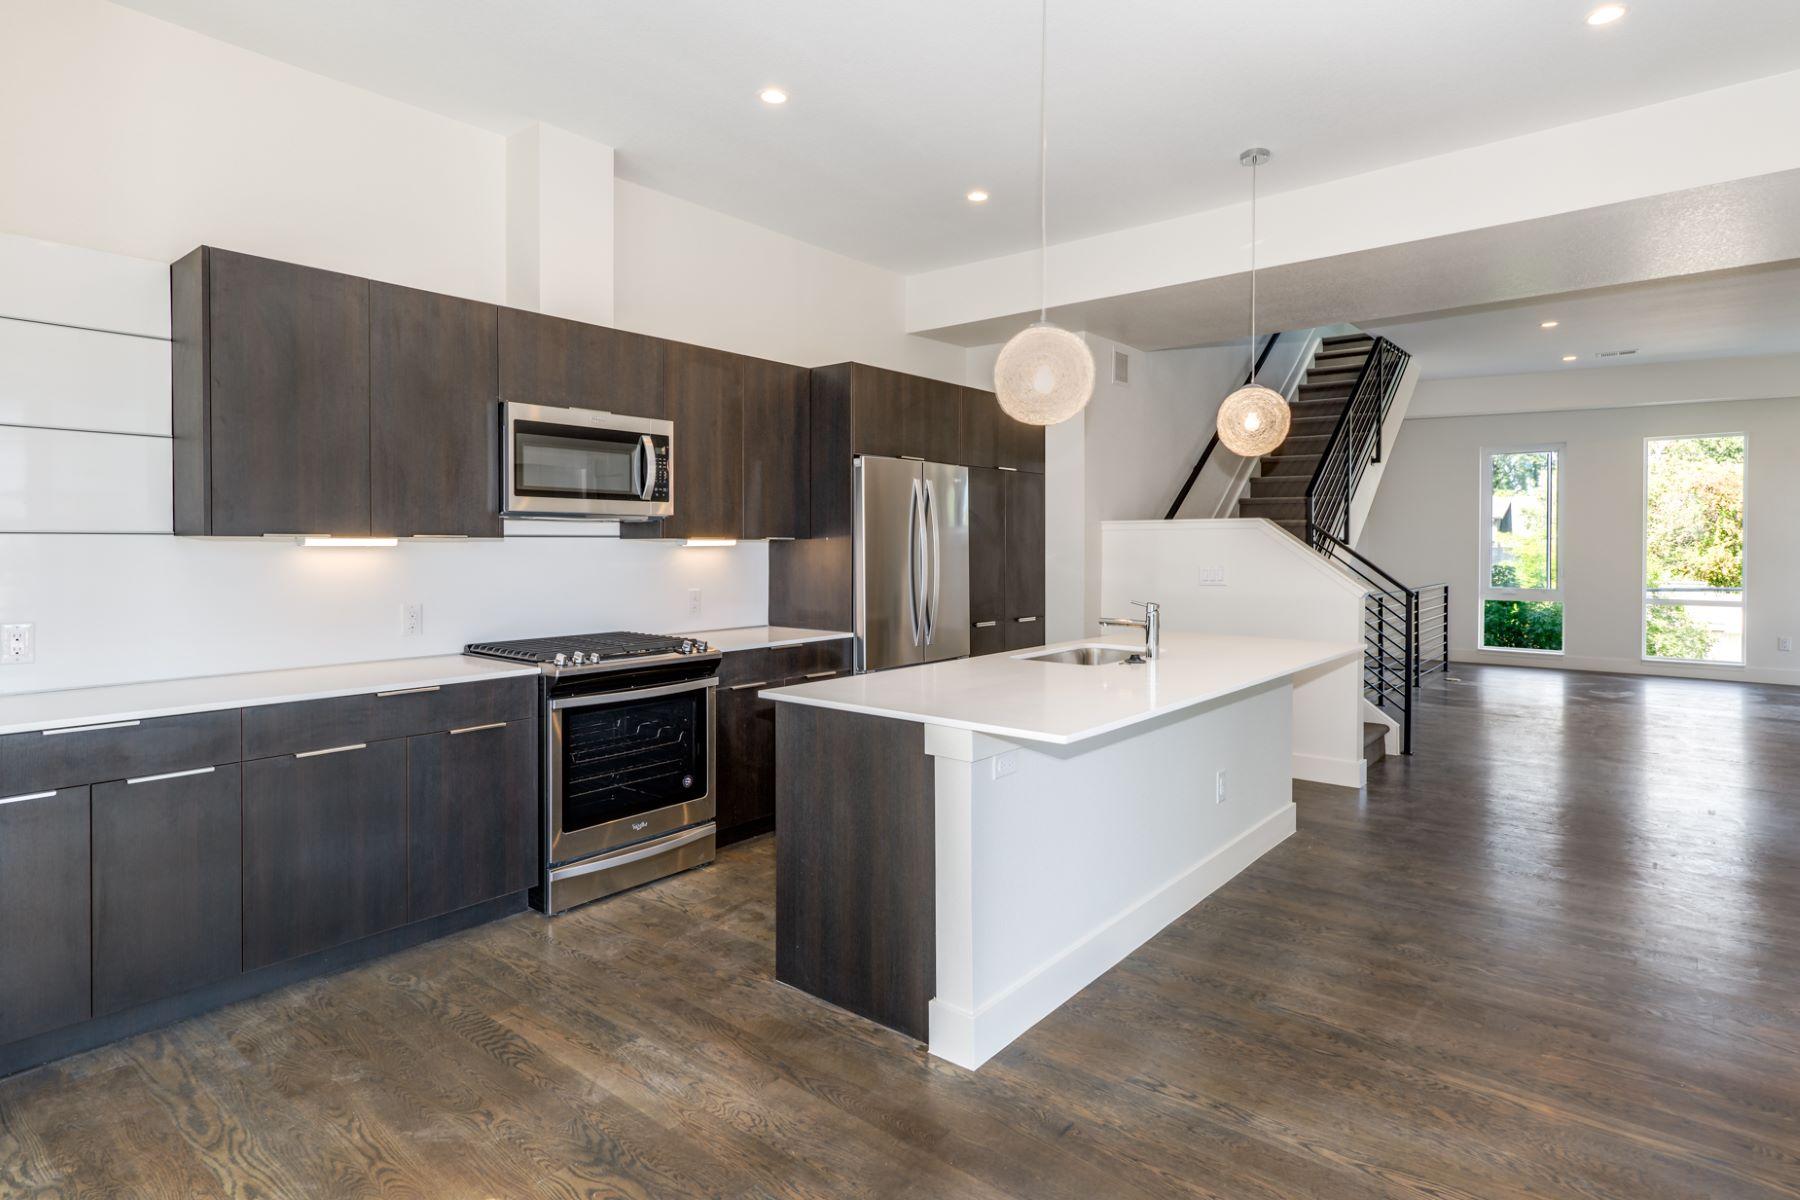 Single Family Home for Active at 4391 Zuni Street 4391 Zuni Street Denver, Colorado 80211 United States